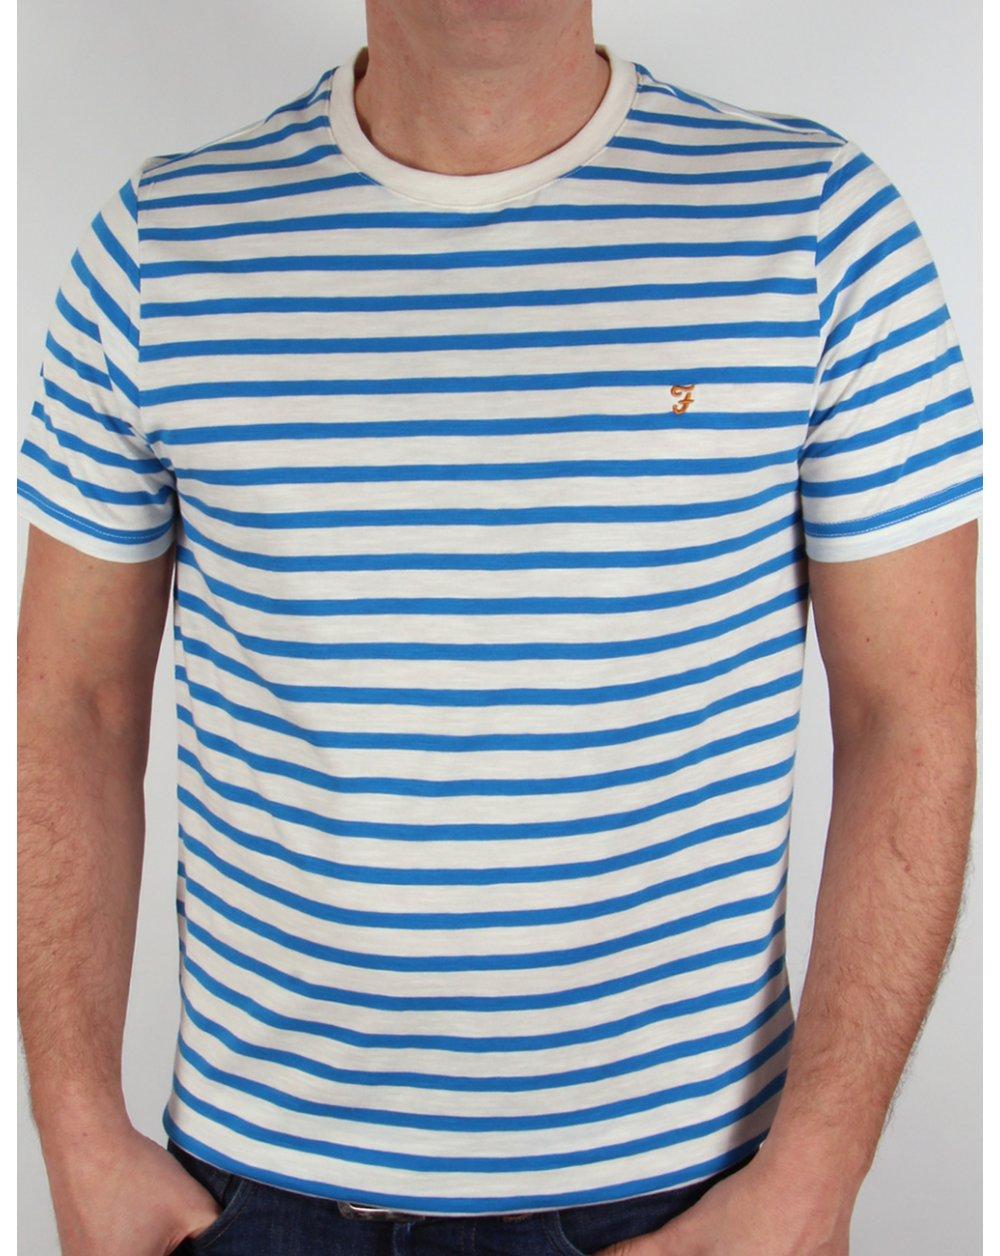 Farah gieger s s striped t shirt white royal blue crew for Blue white striped t shirt